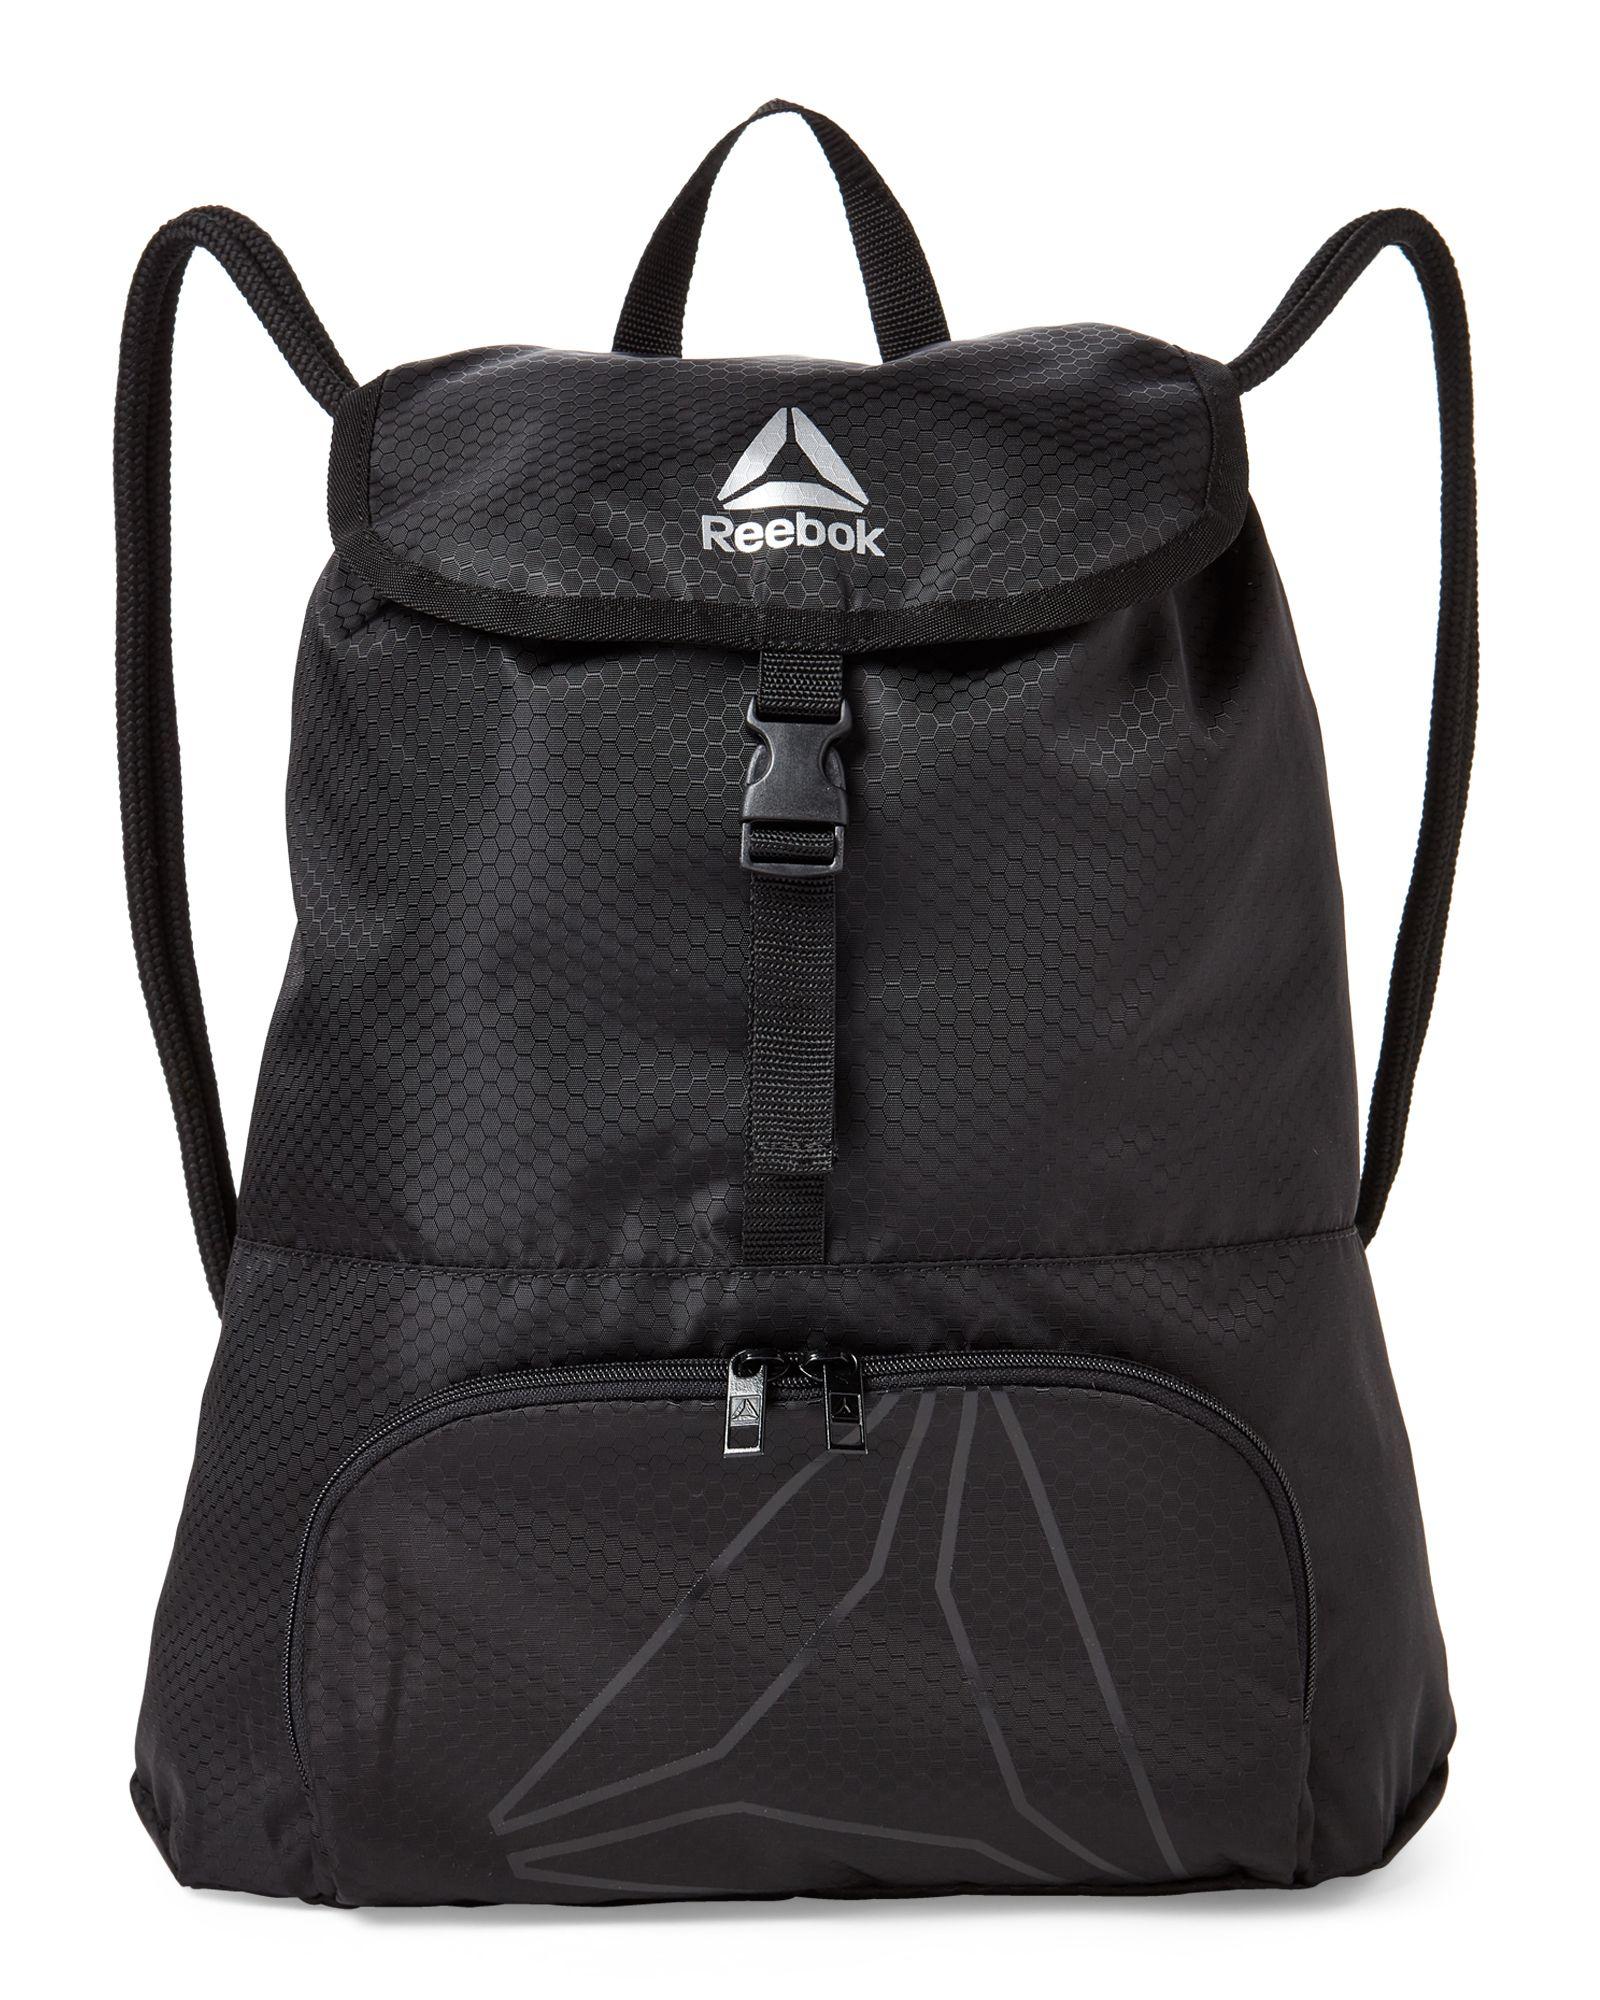 5fd6caf1a6 Reebok Black Mica Drawstring Backpack Drawstring Backpack